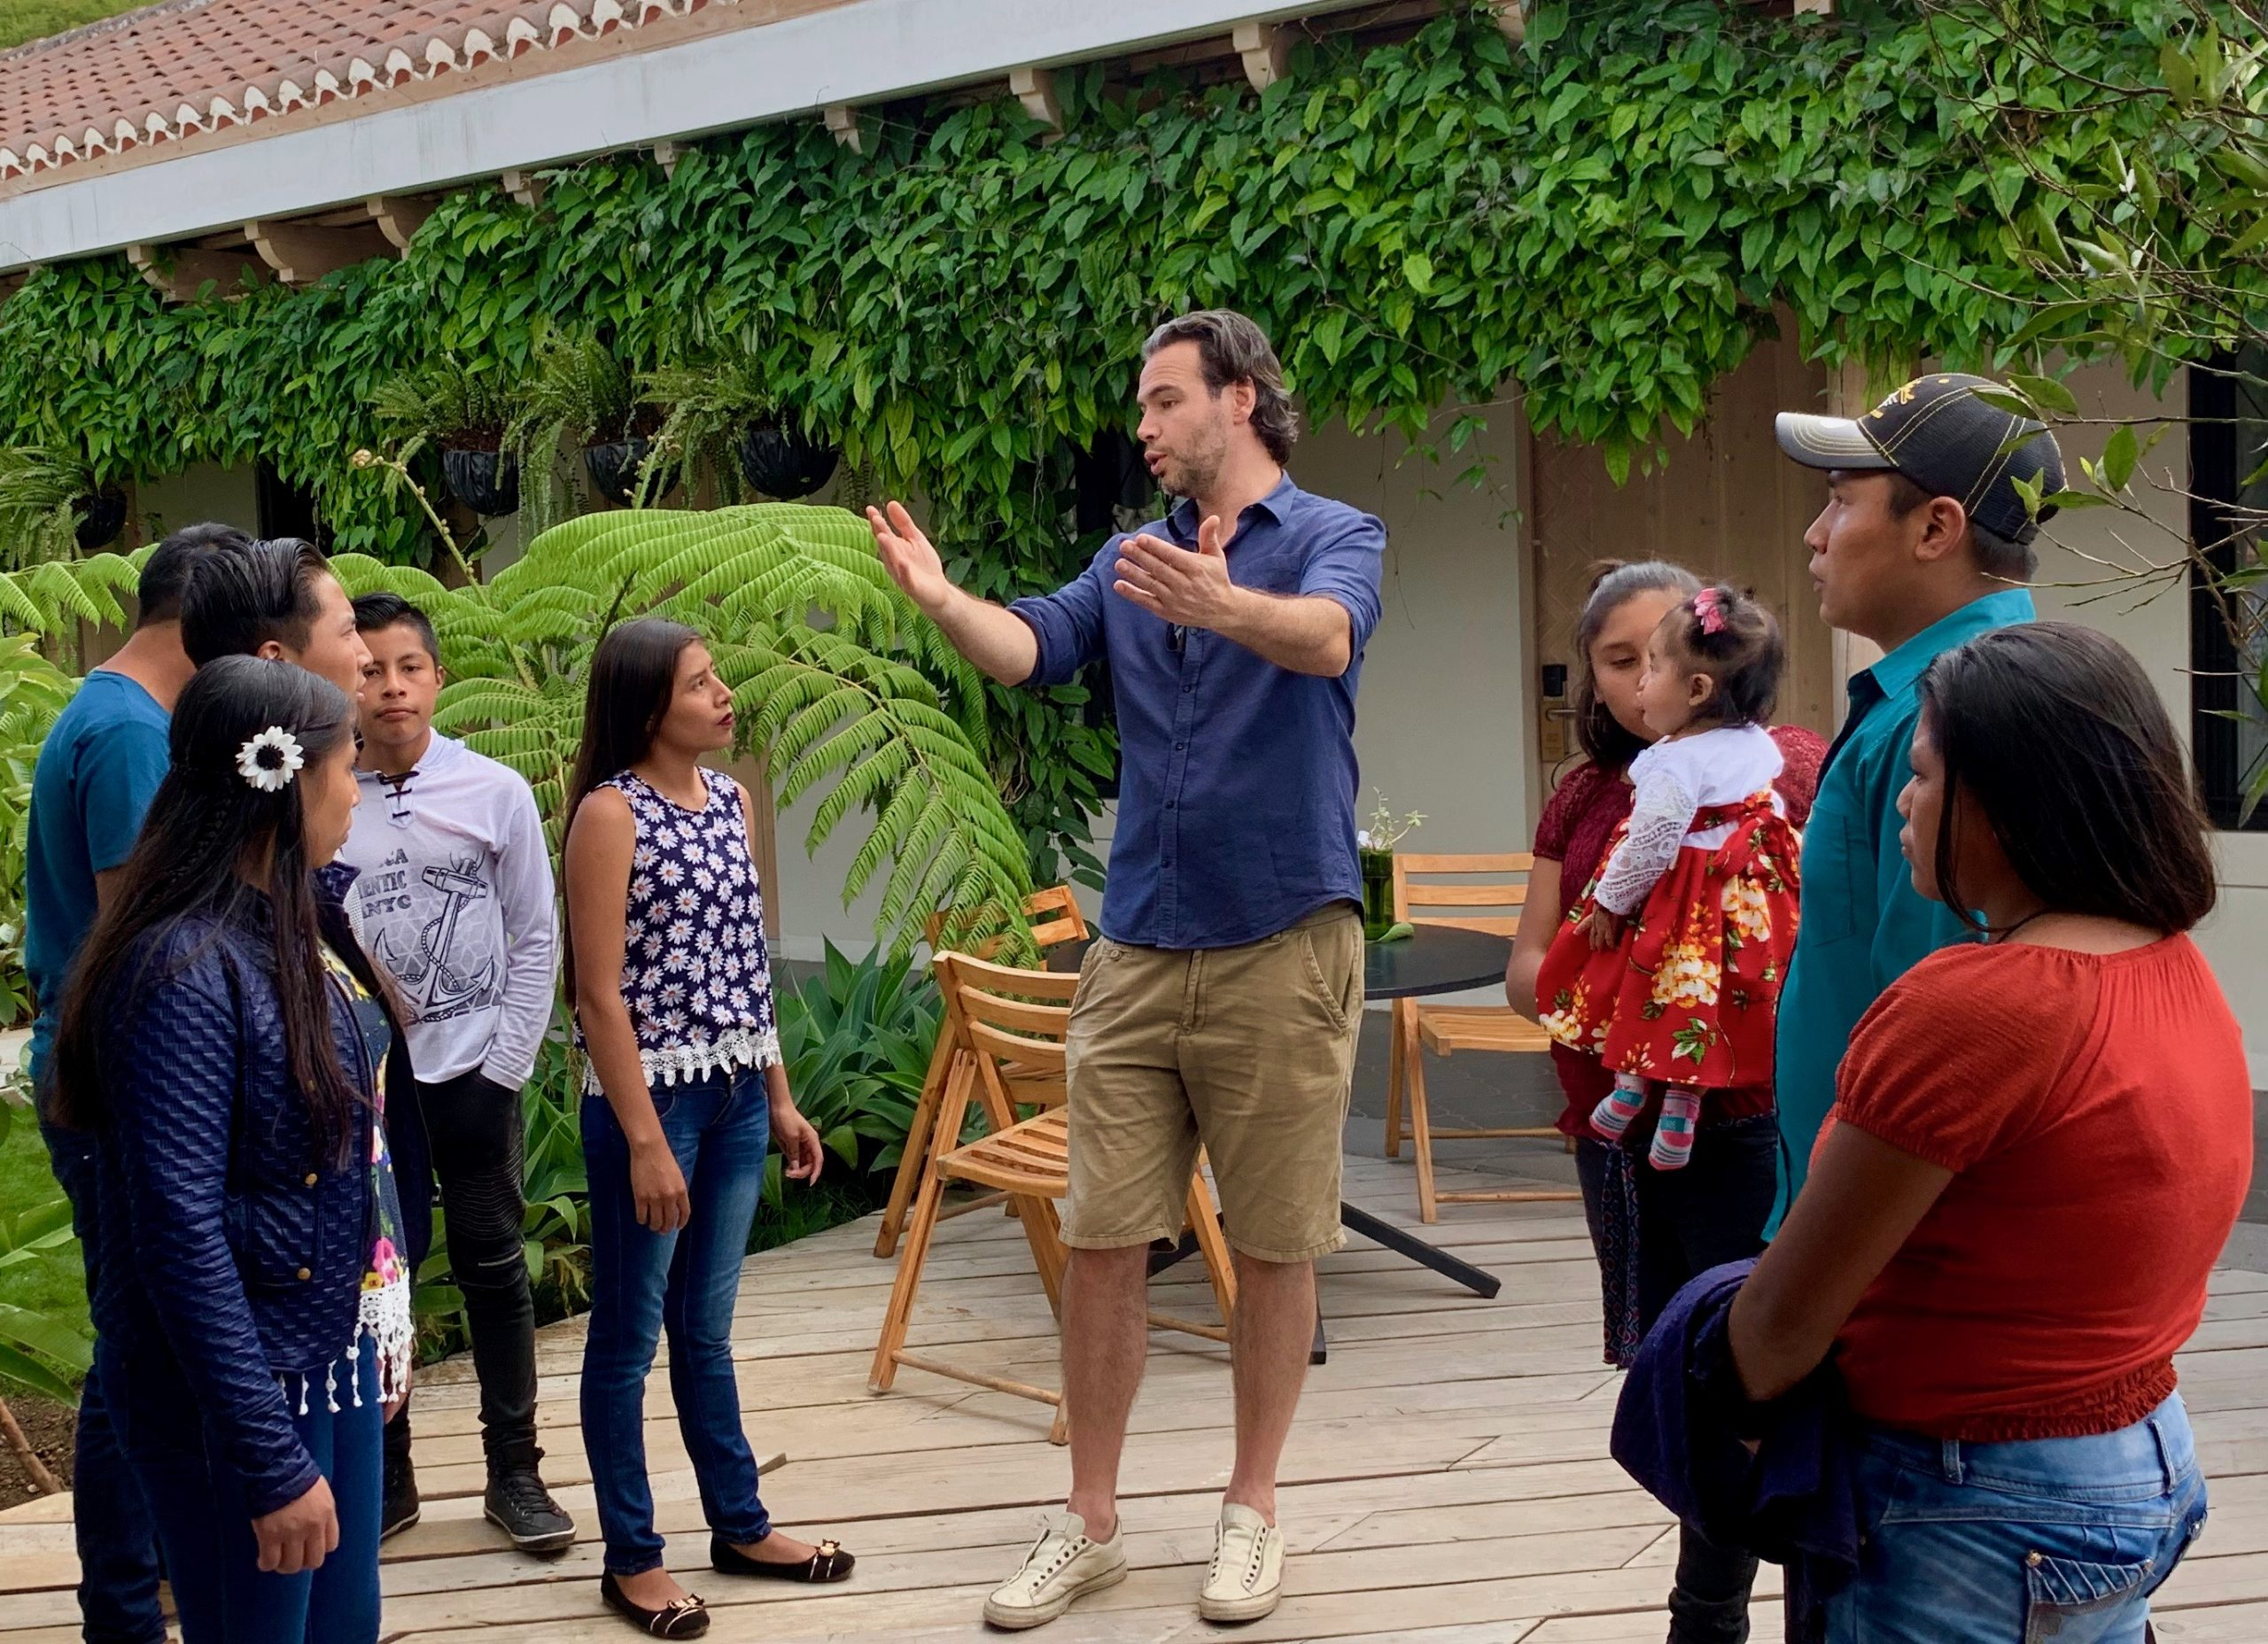 Niños de Guatemala: the leaders of the future